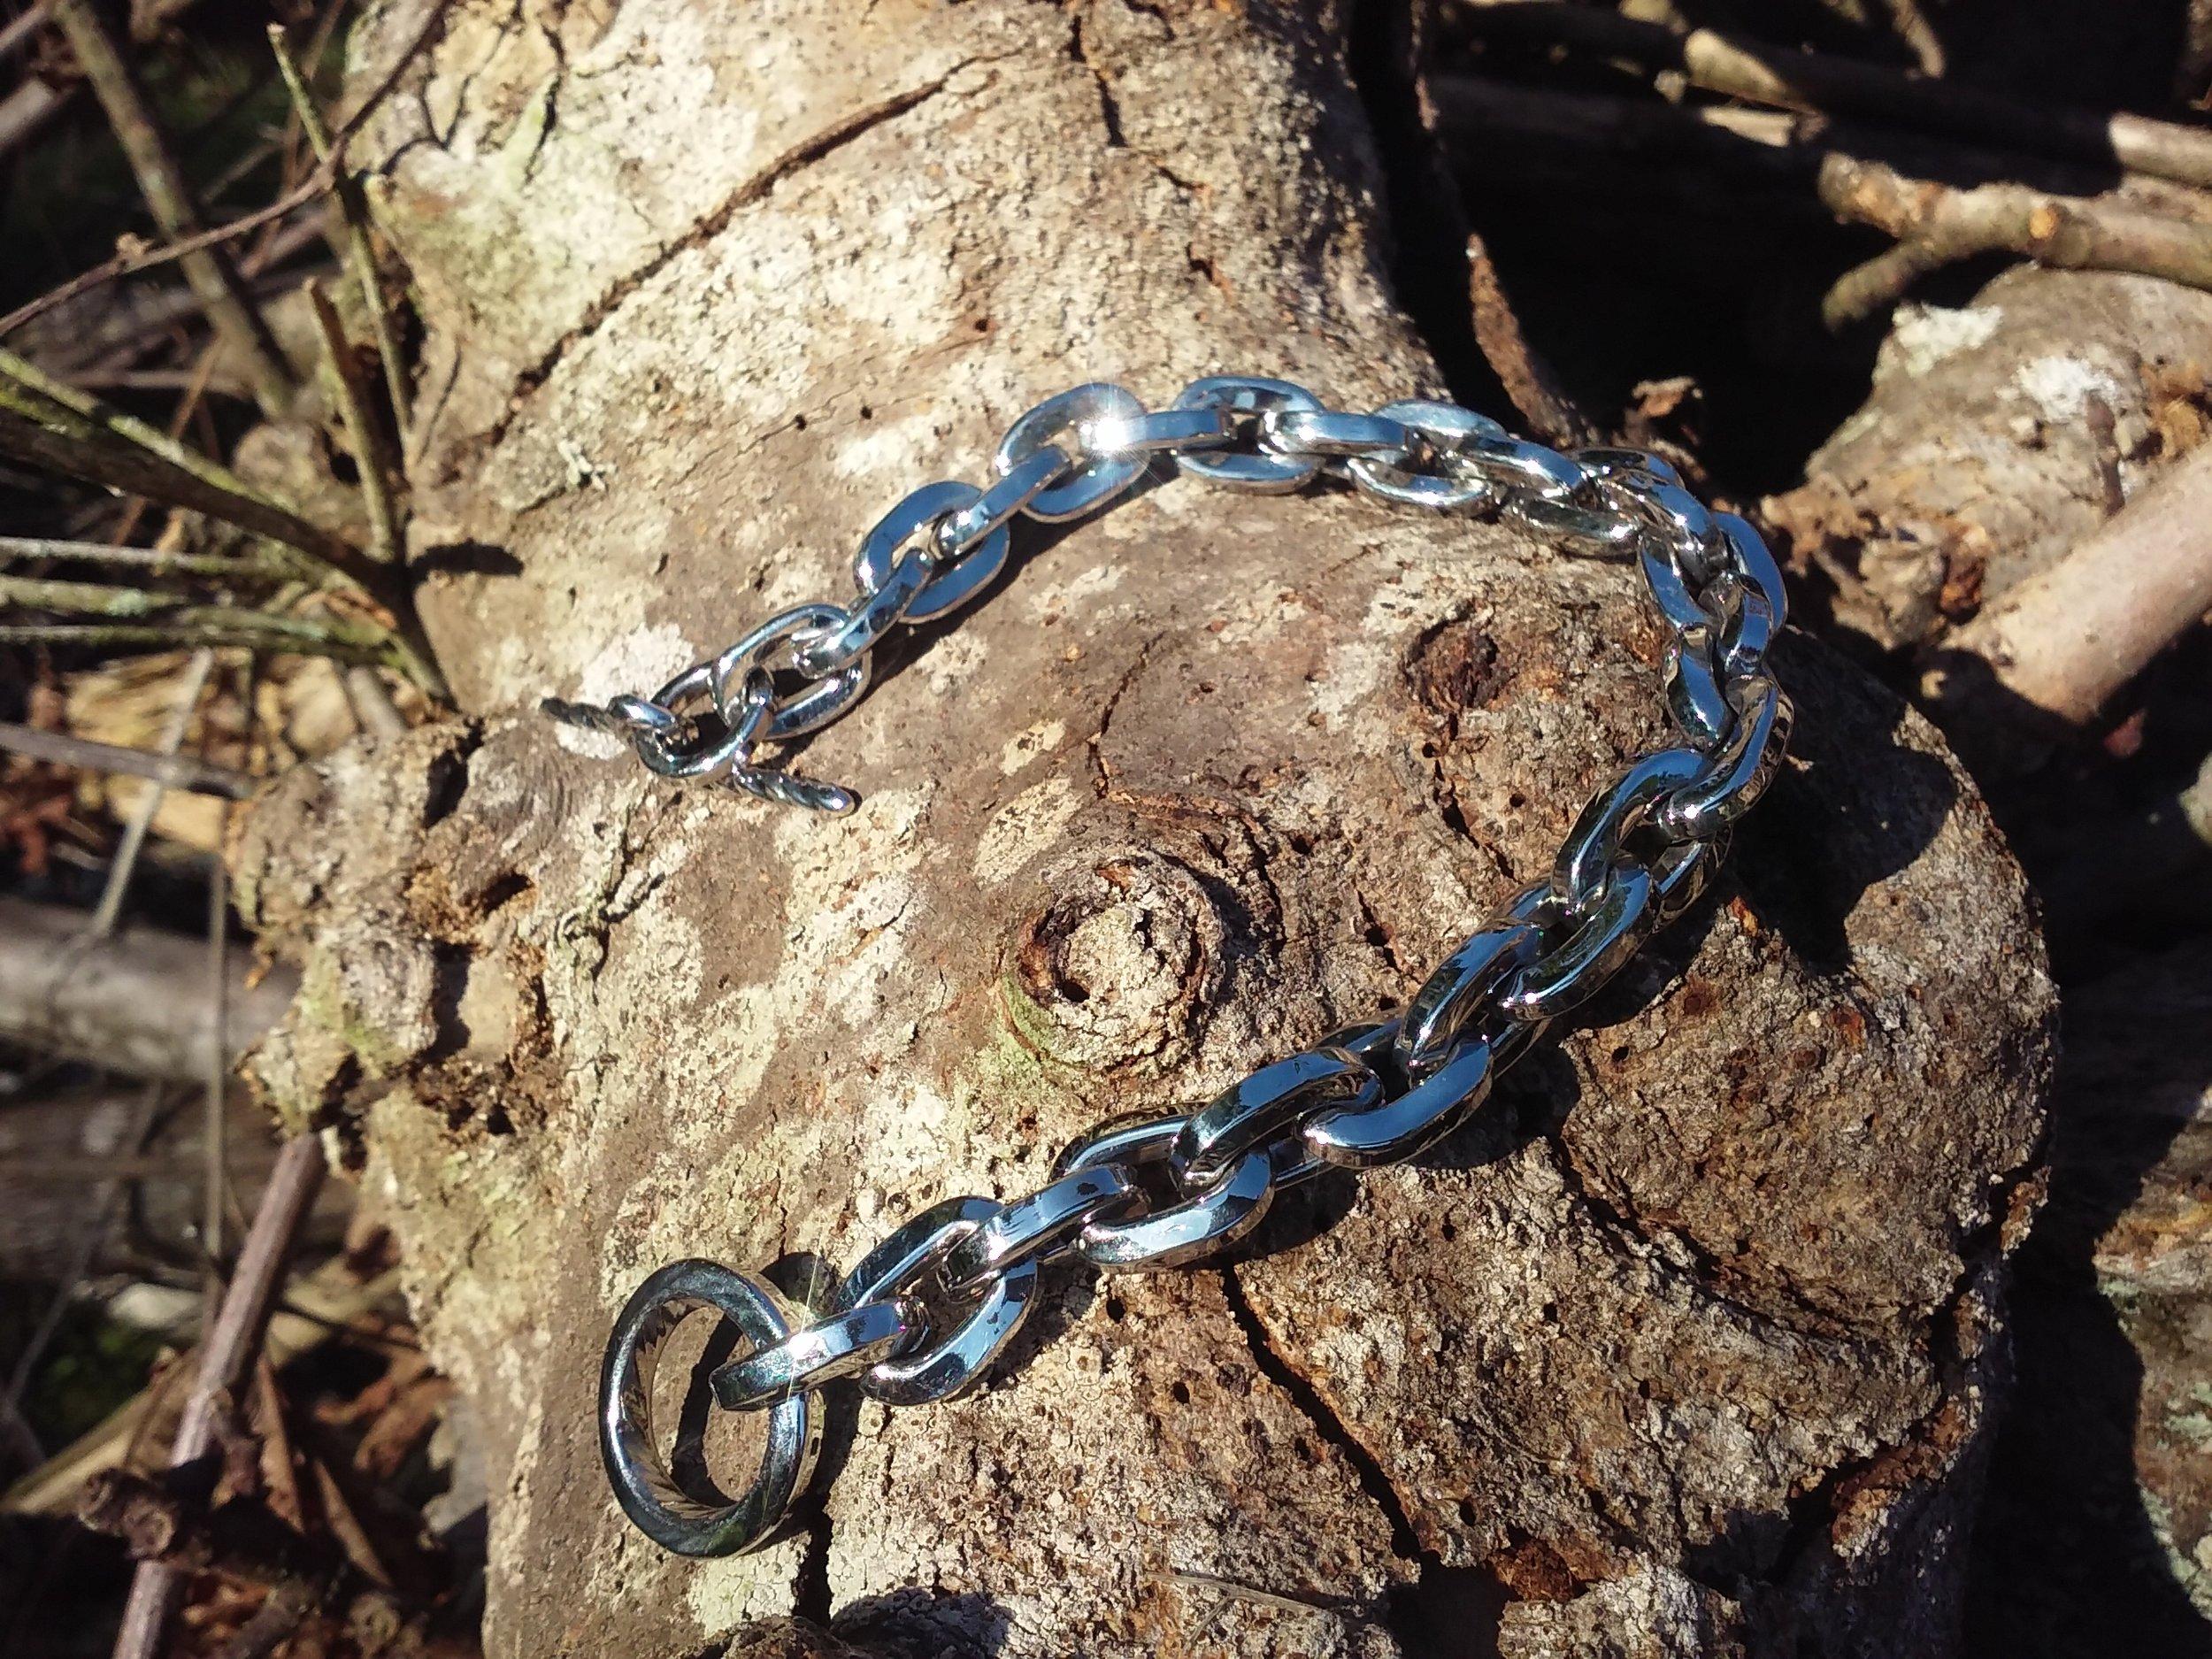 Lynn Breaux, Jewelry   http://lynnsmetalart.com